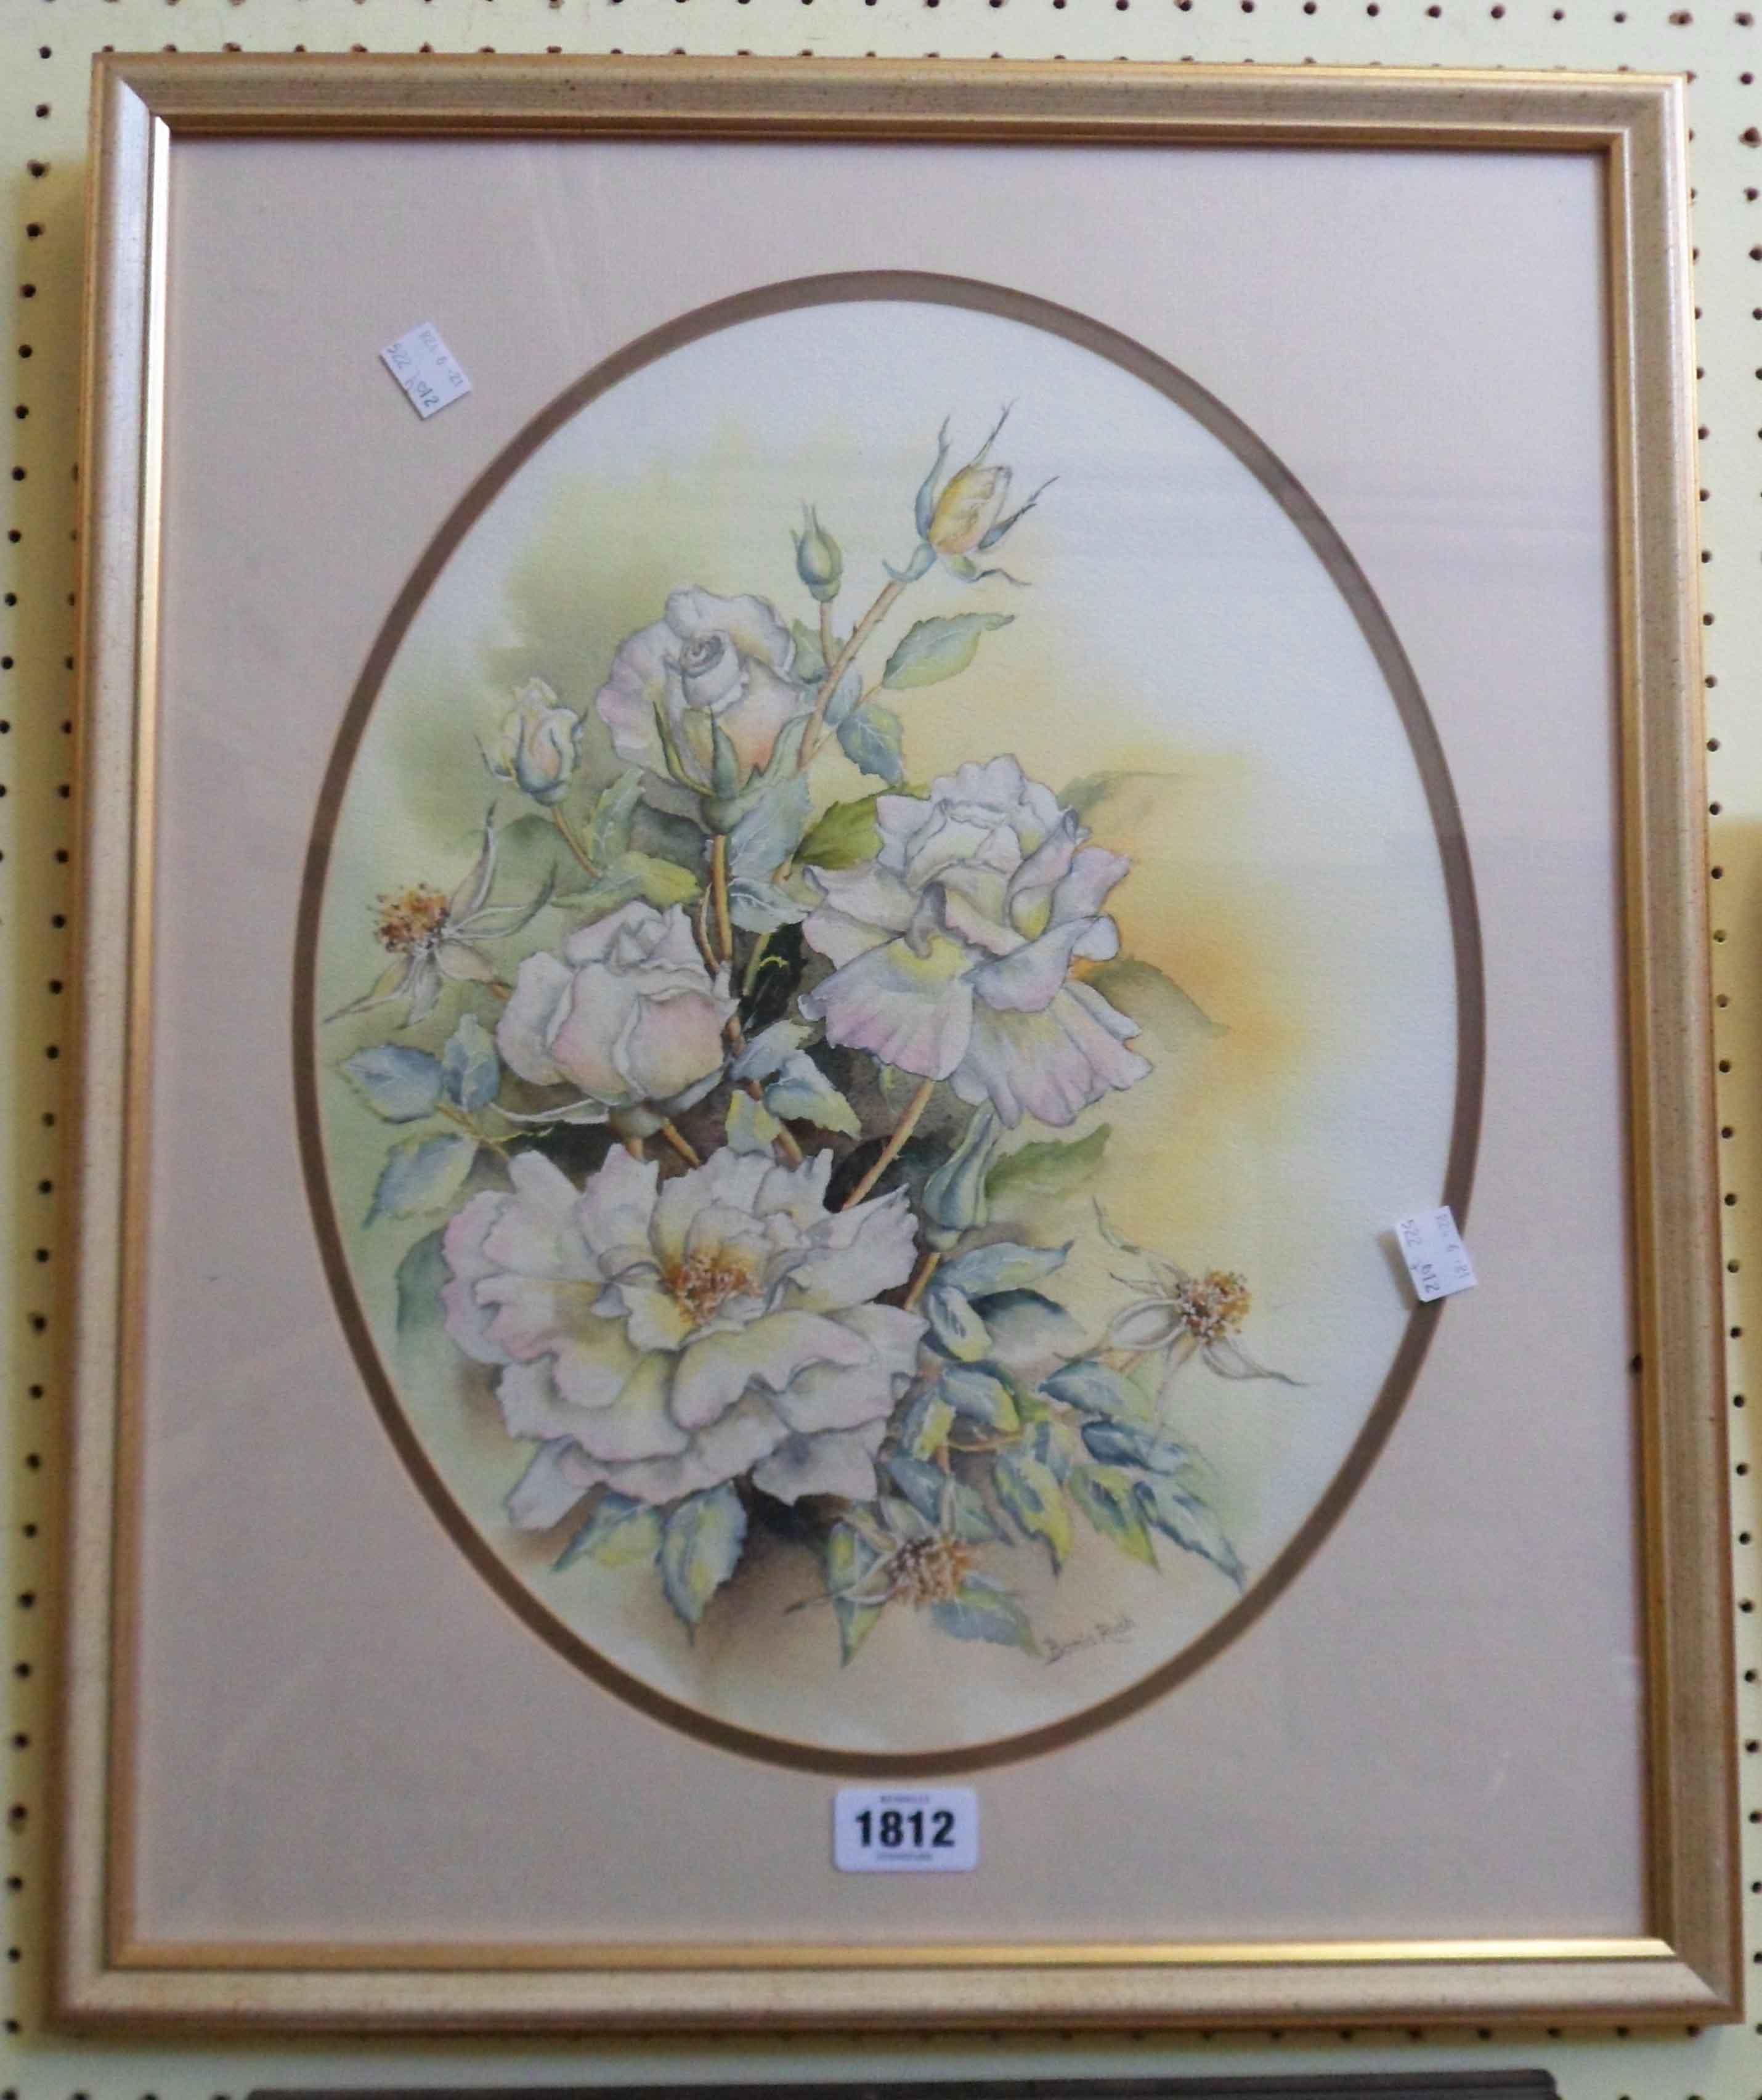 Bonia Rush: a gilt framed still life study of roses - signed, in oval mount